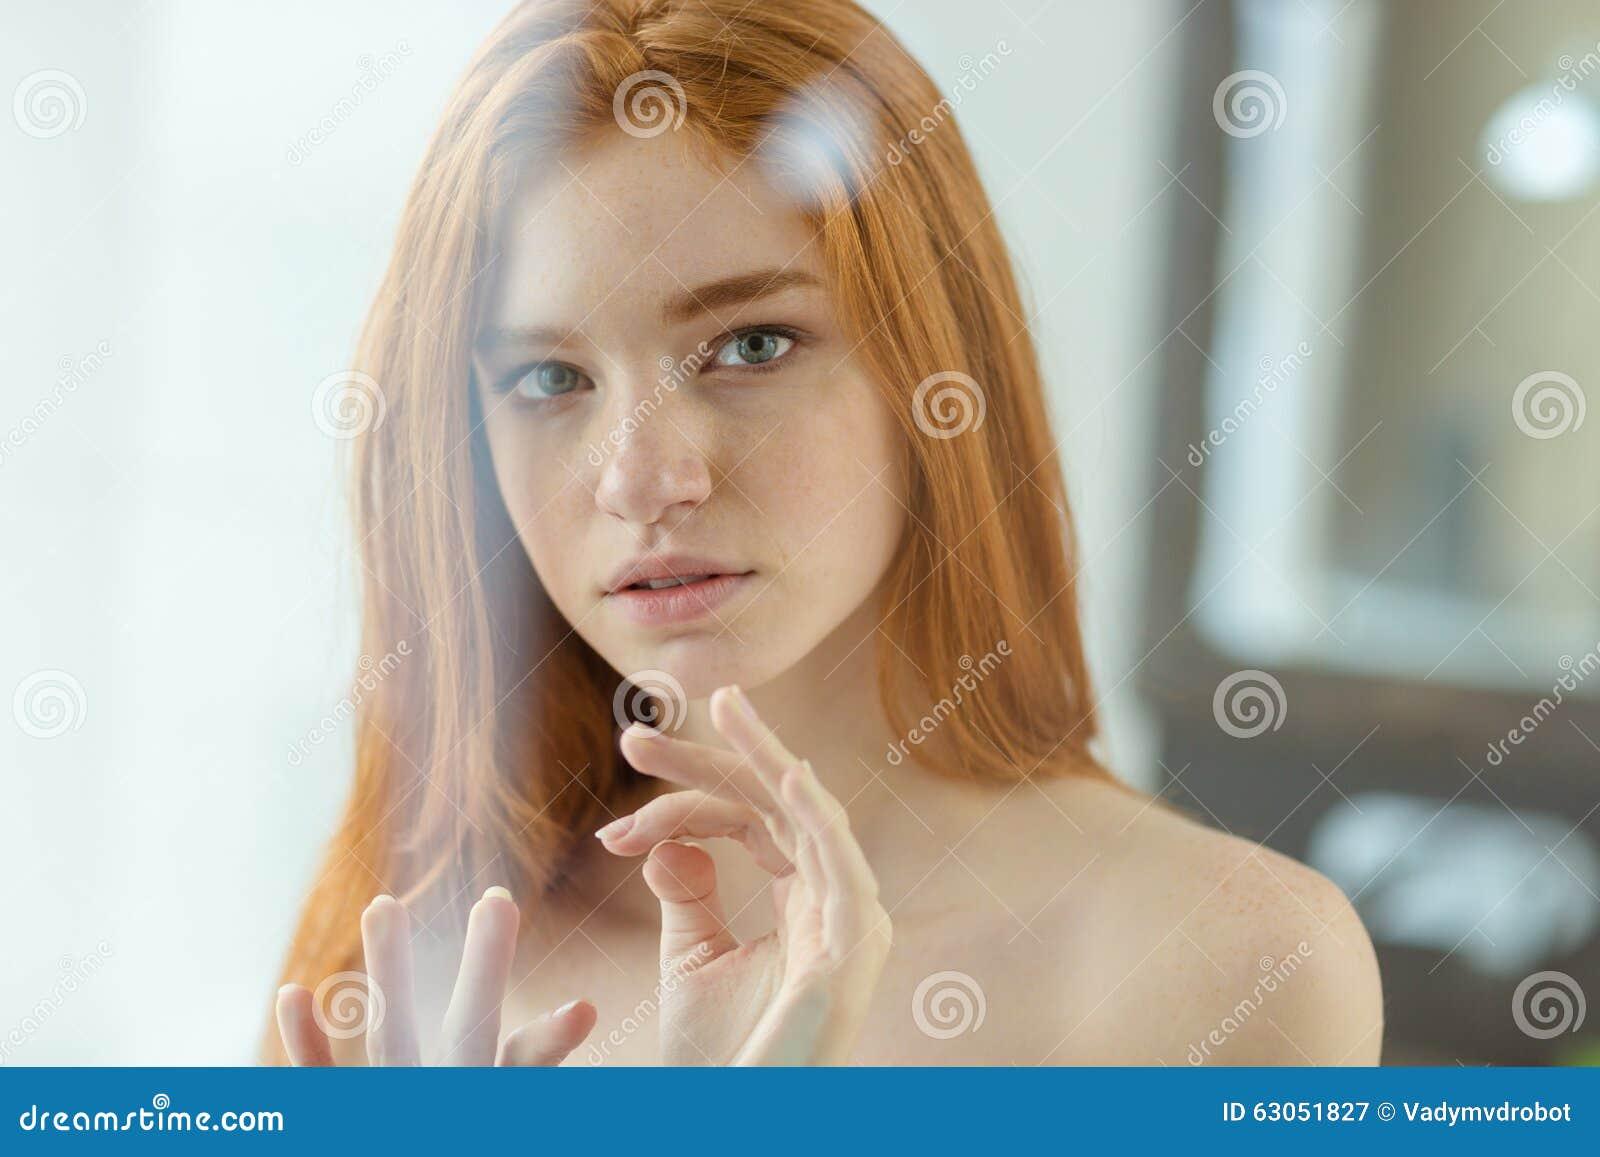 Amanda pogrell latex nude